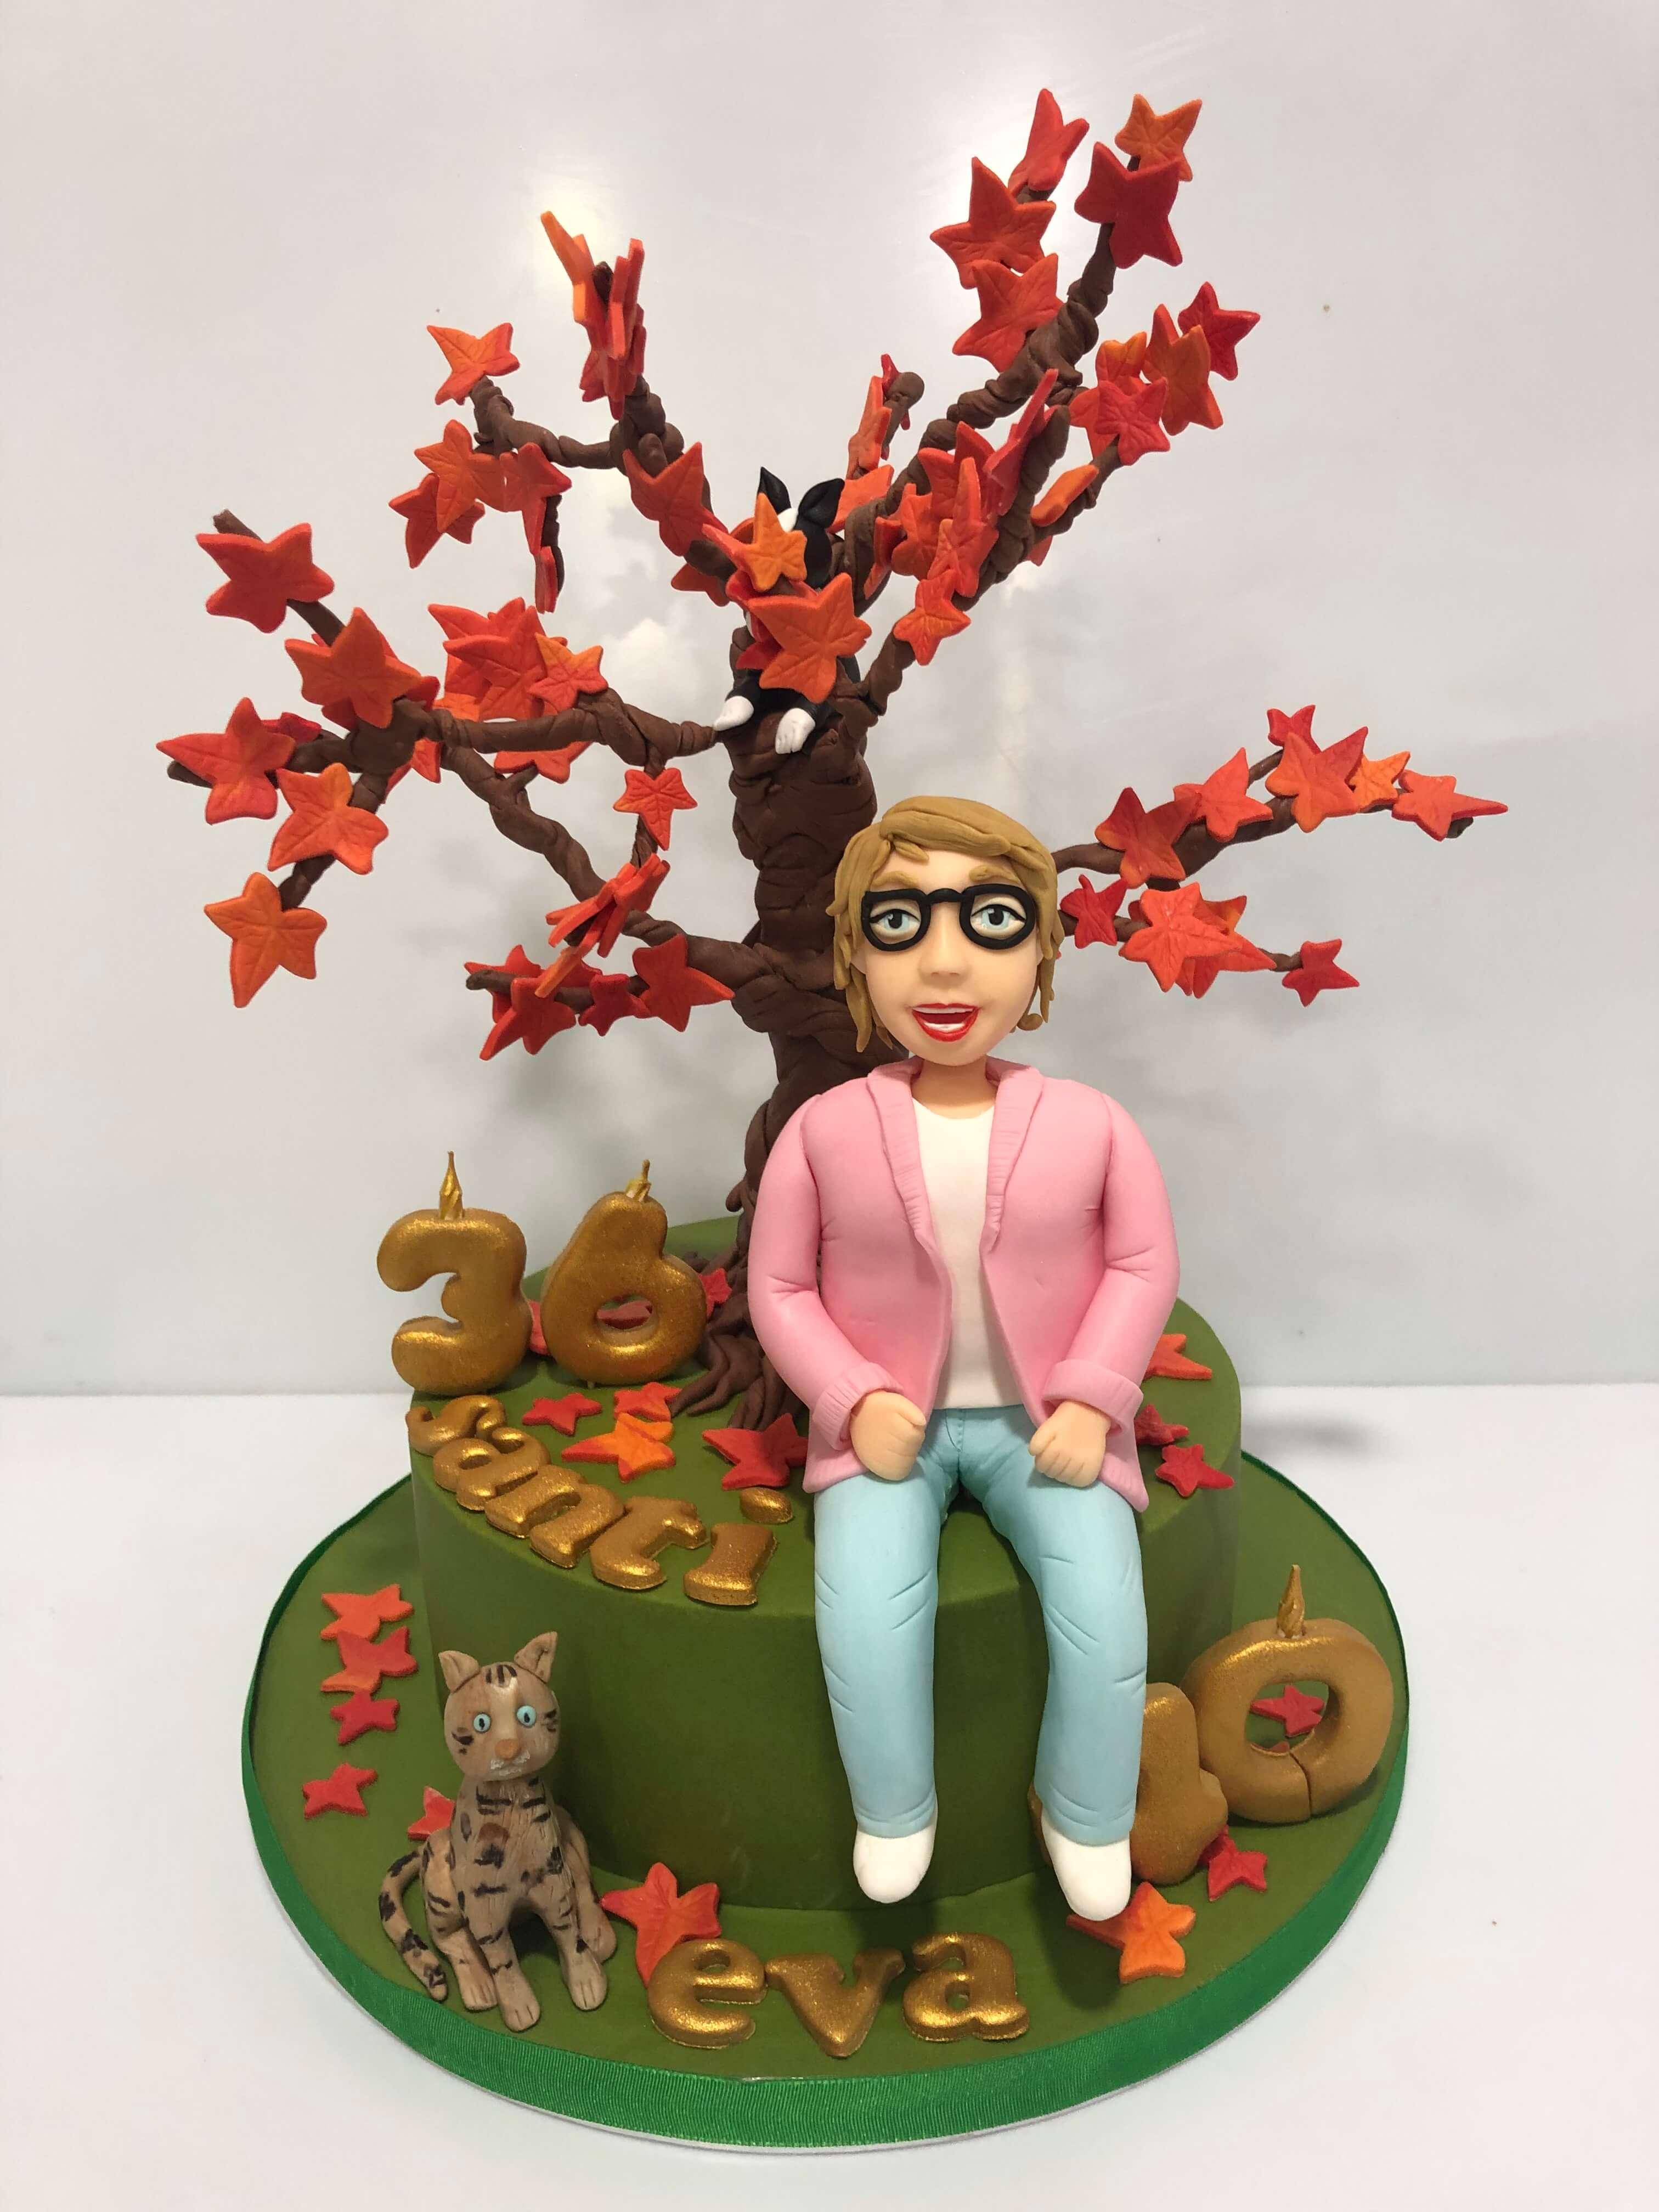 Tarta personalizada fondant cumpleaños bonsai figura personalizada mujer coruña